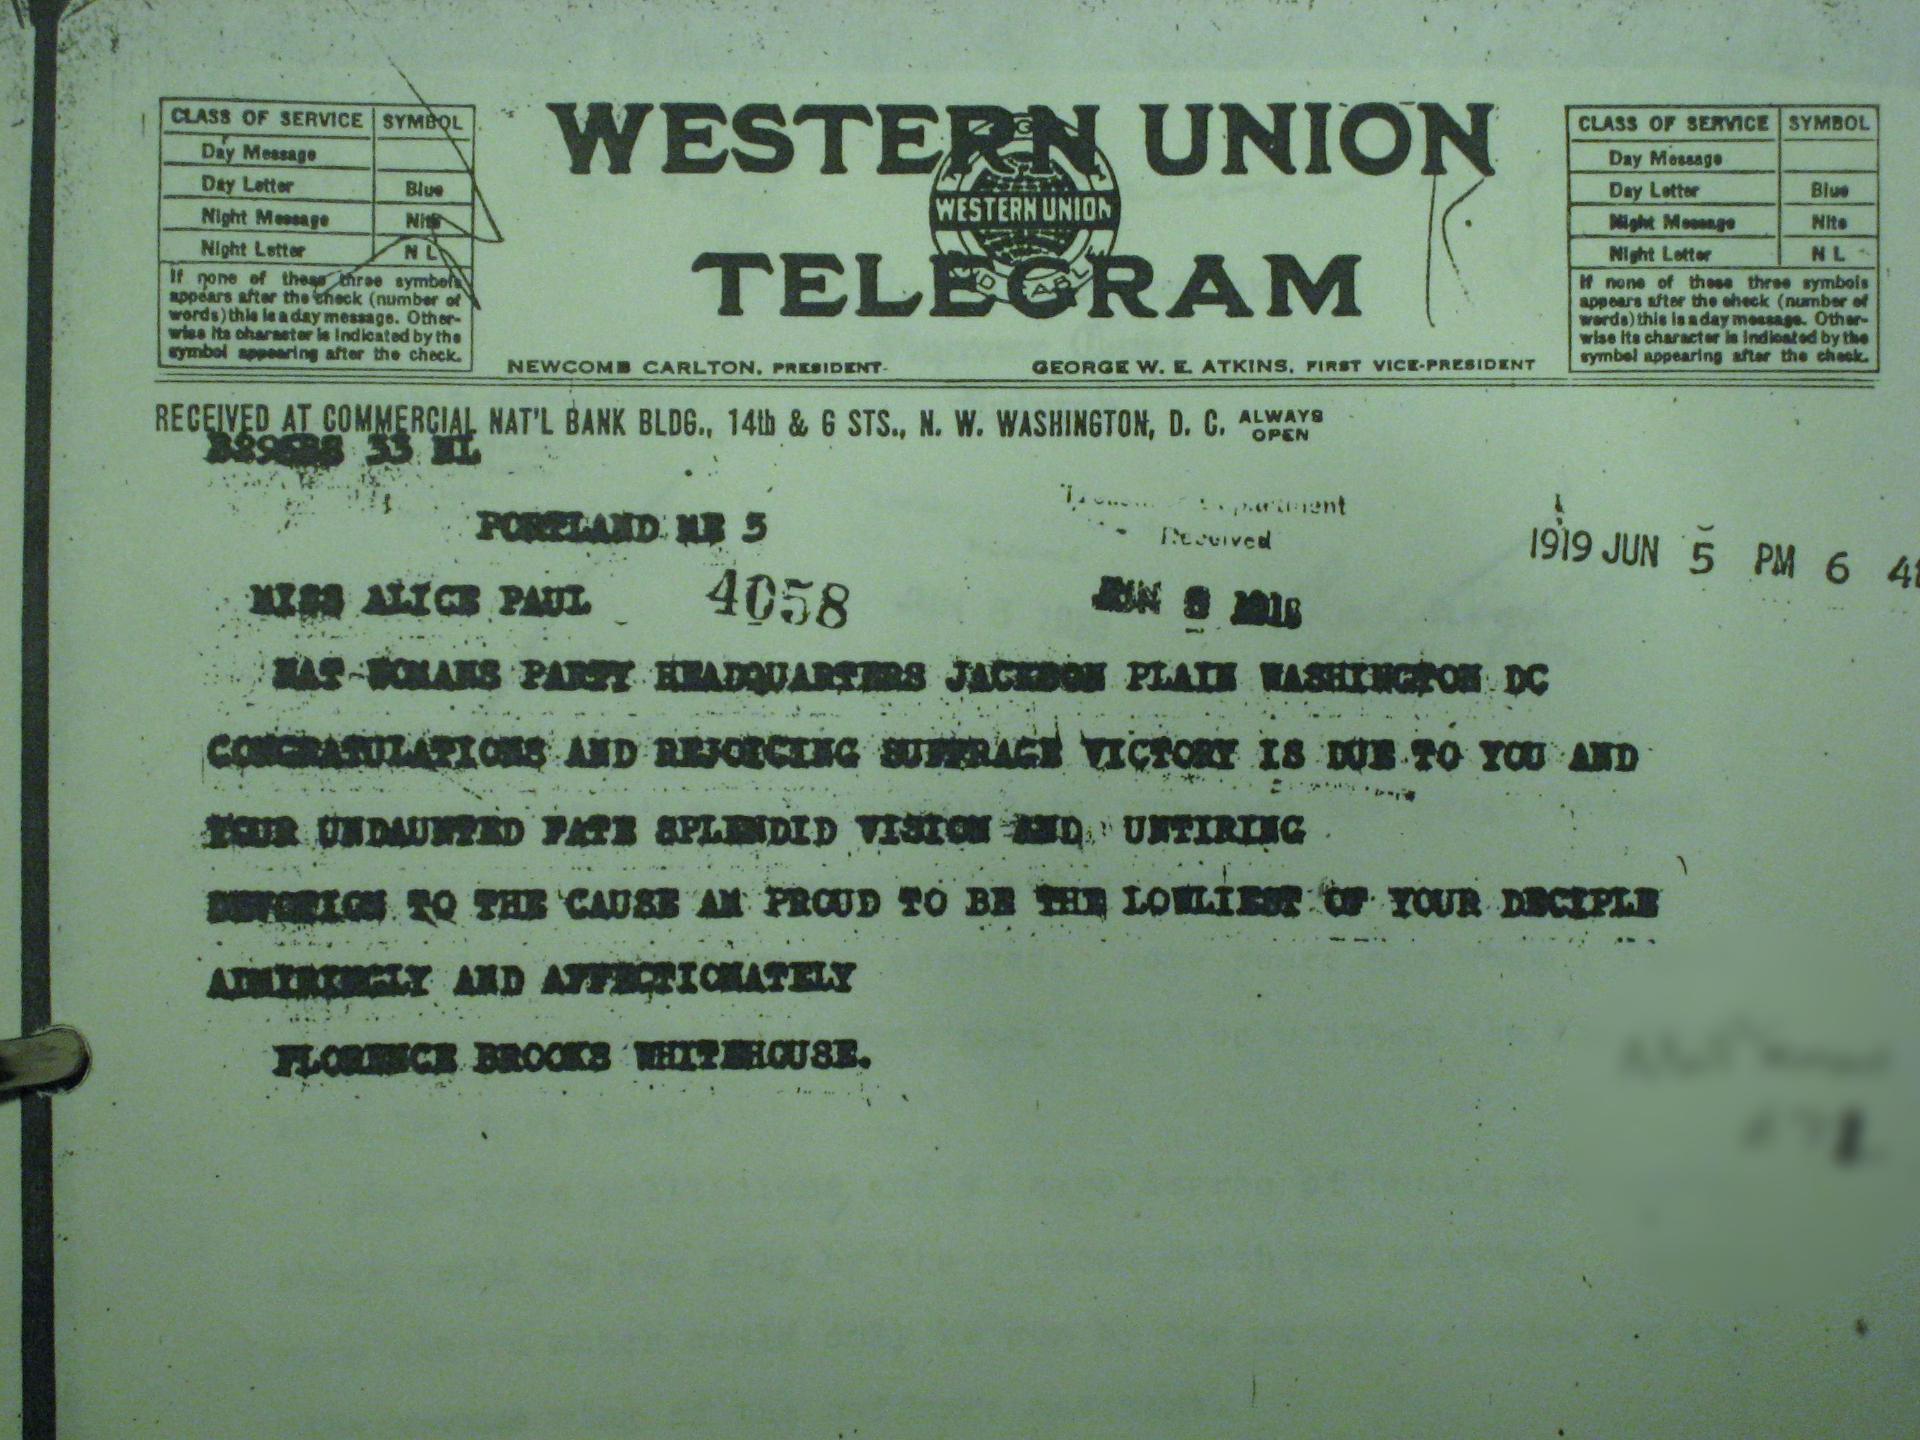 FBW Telegram to Alice Paul